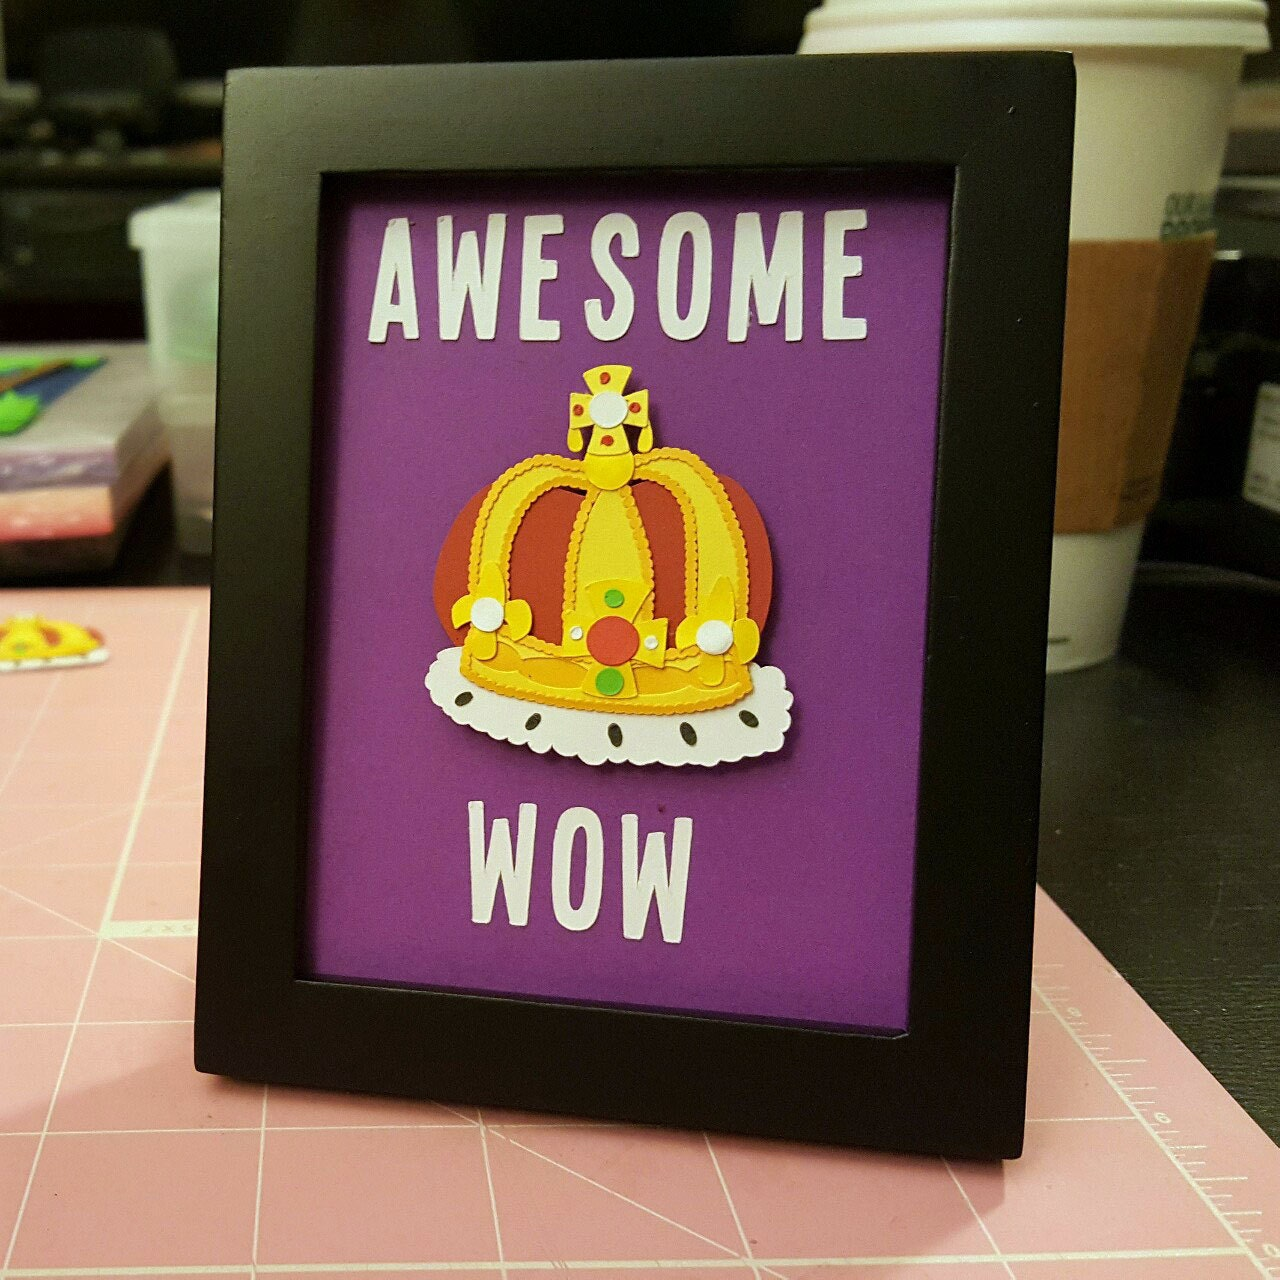 Awesome. Wow. Mini-Frame